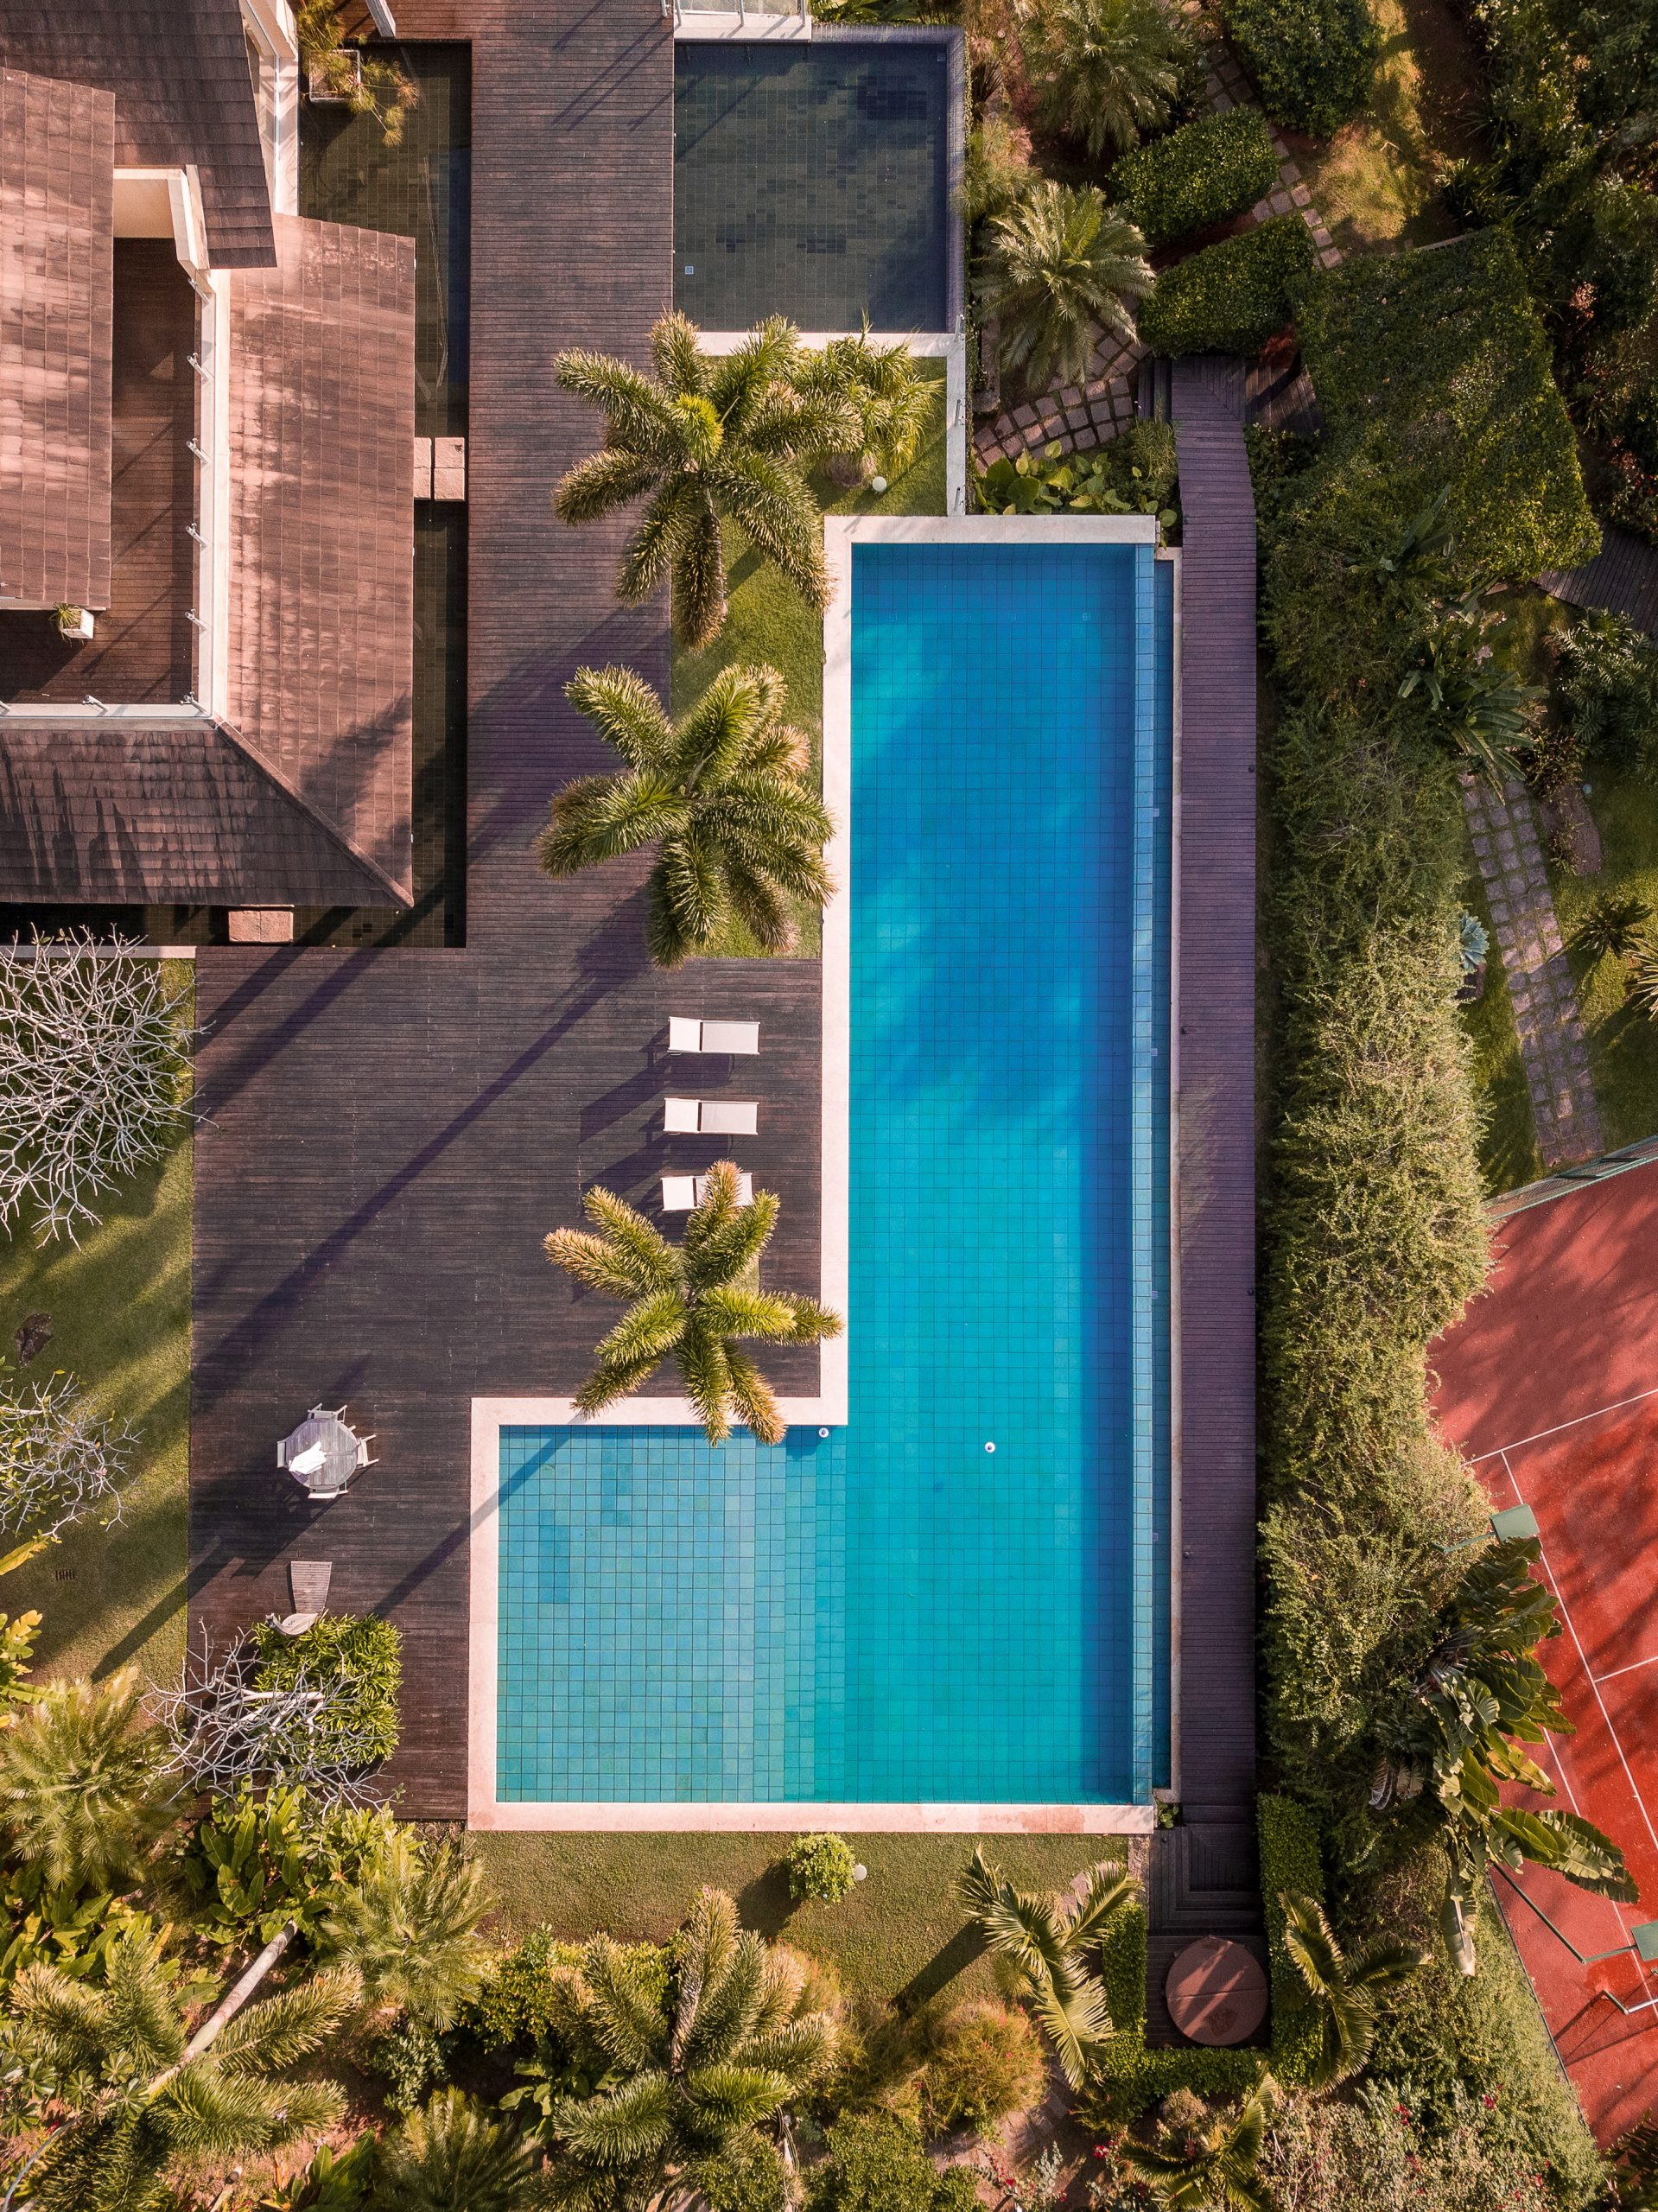 Search Pool Homes For Sale In Mandarin Jacksonville FL - Julington Group - Realtor - Call (904) 200-5492